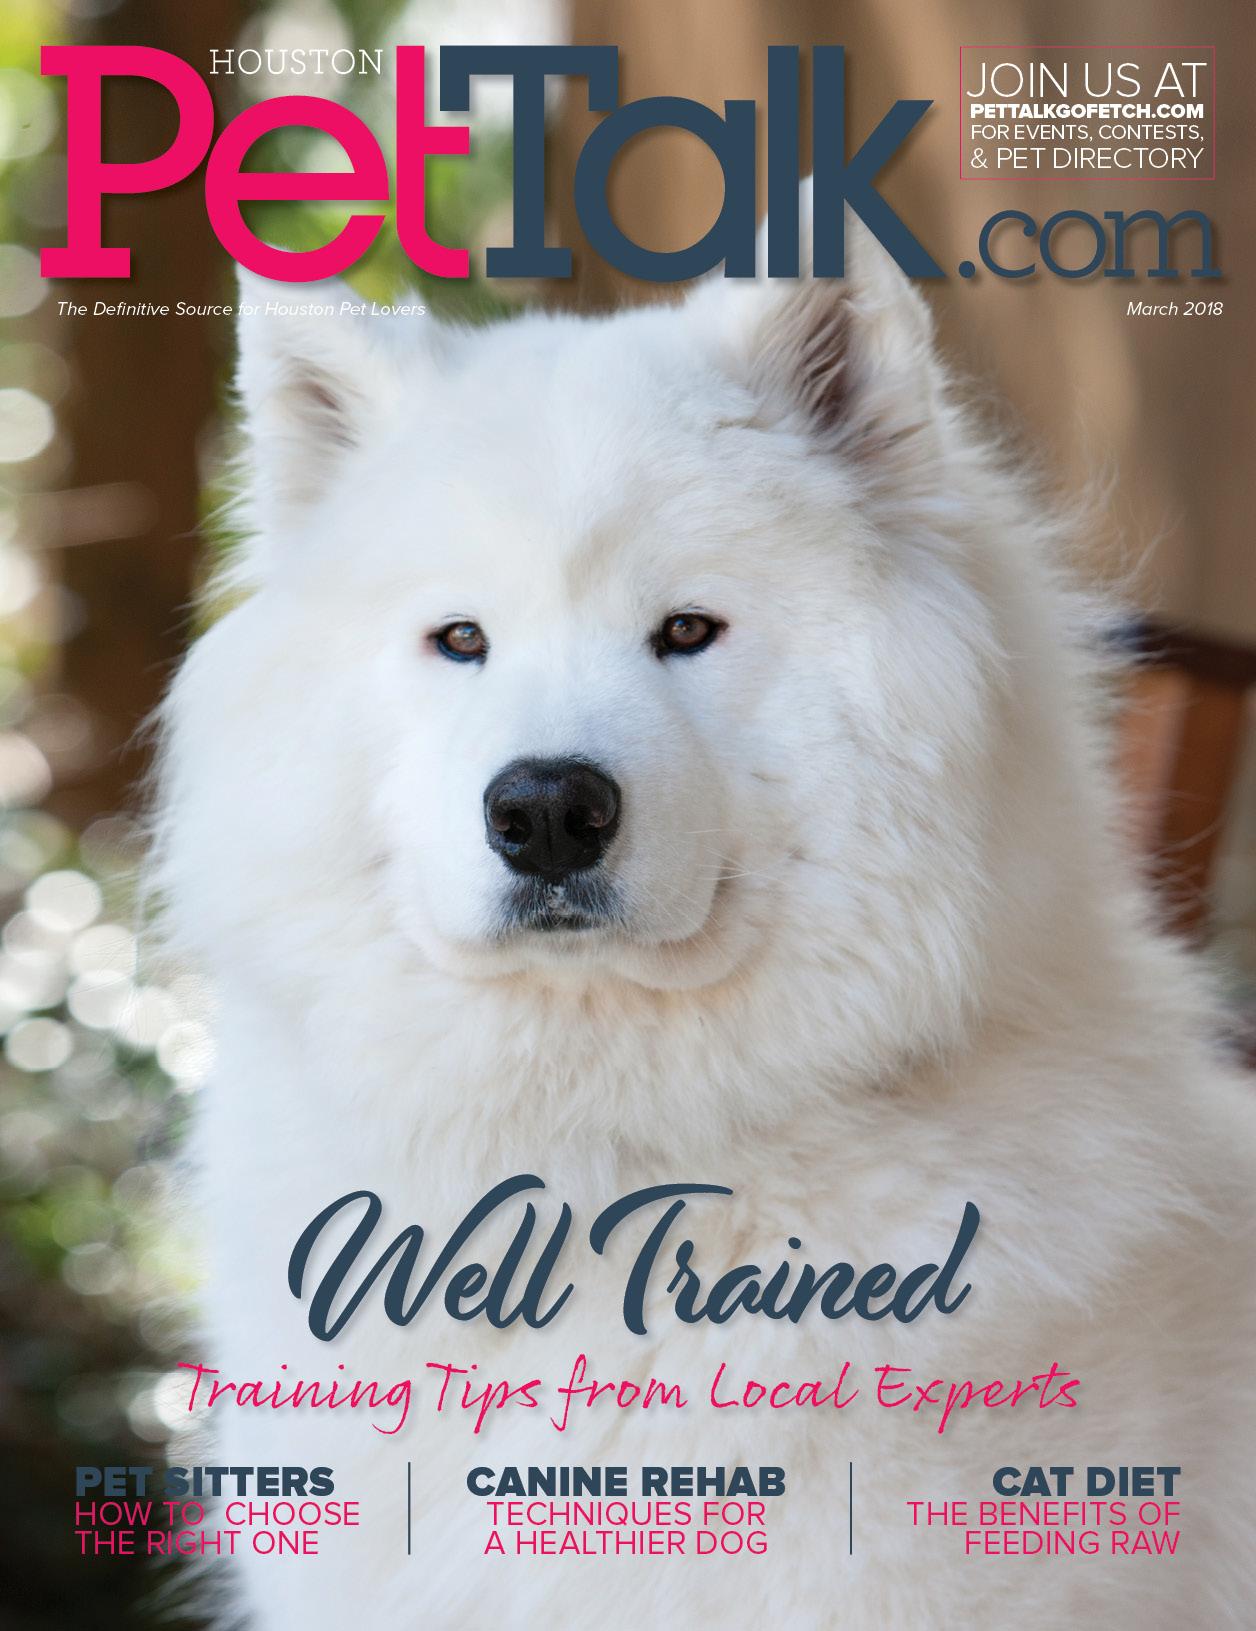 March 2018 Digital Issue of Houston PetTalk